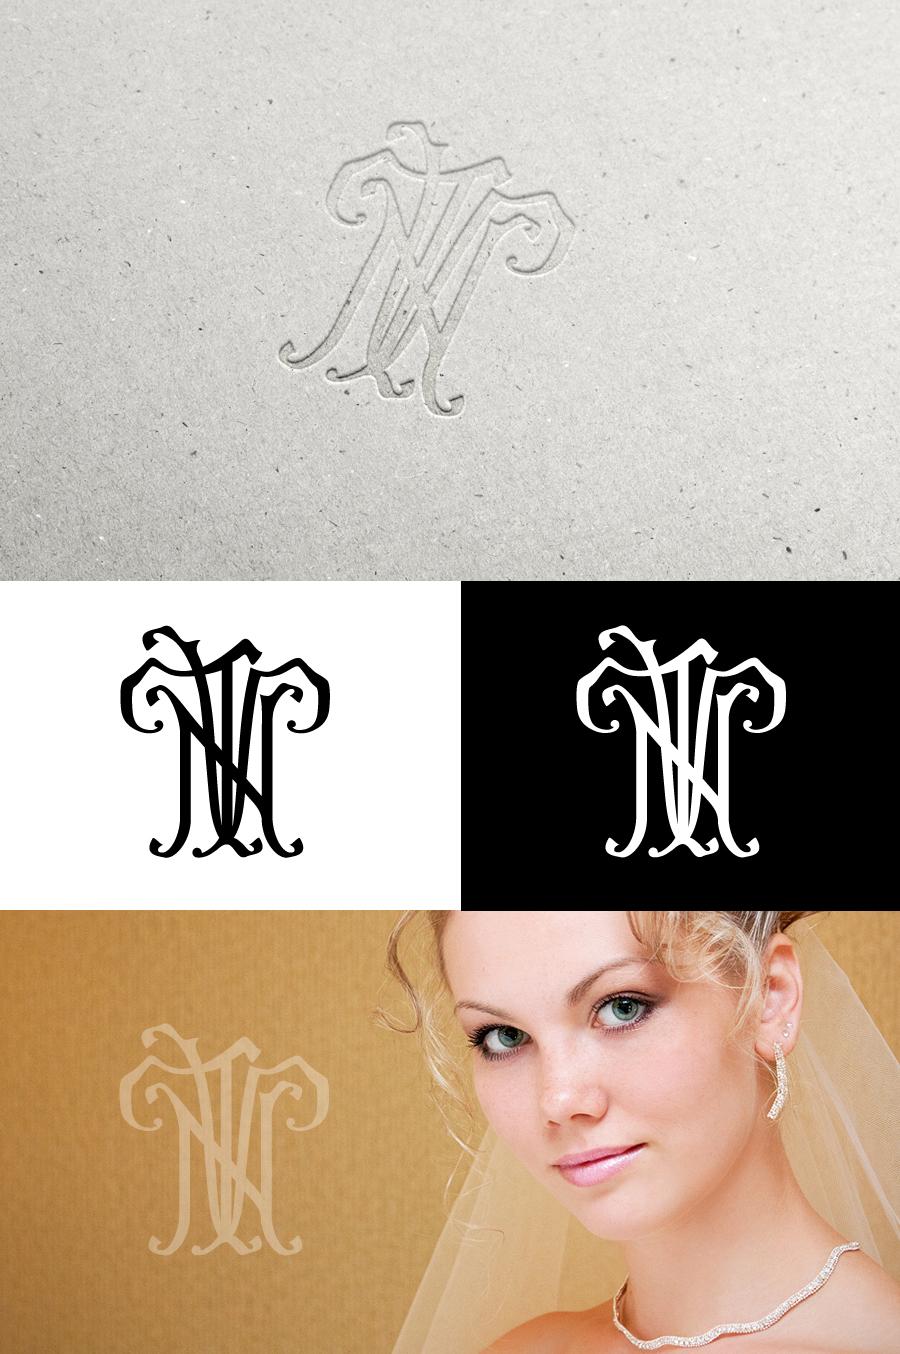 превью_лого